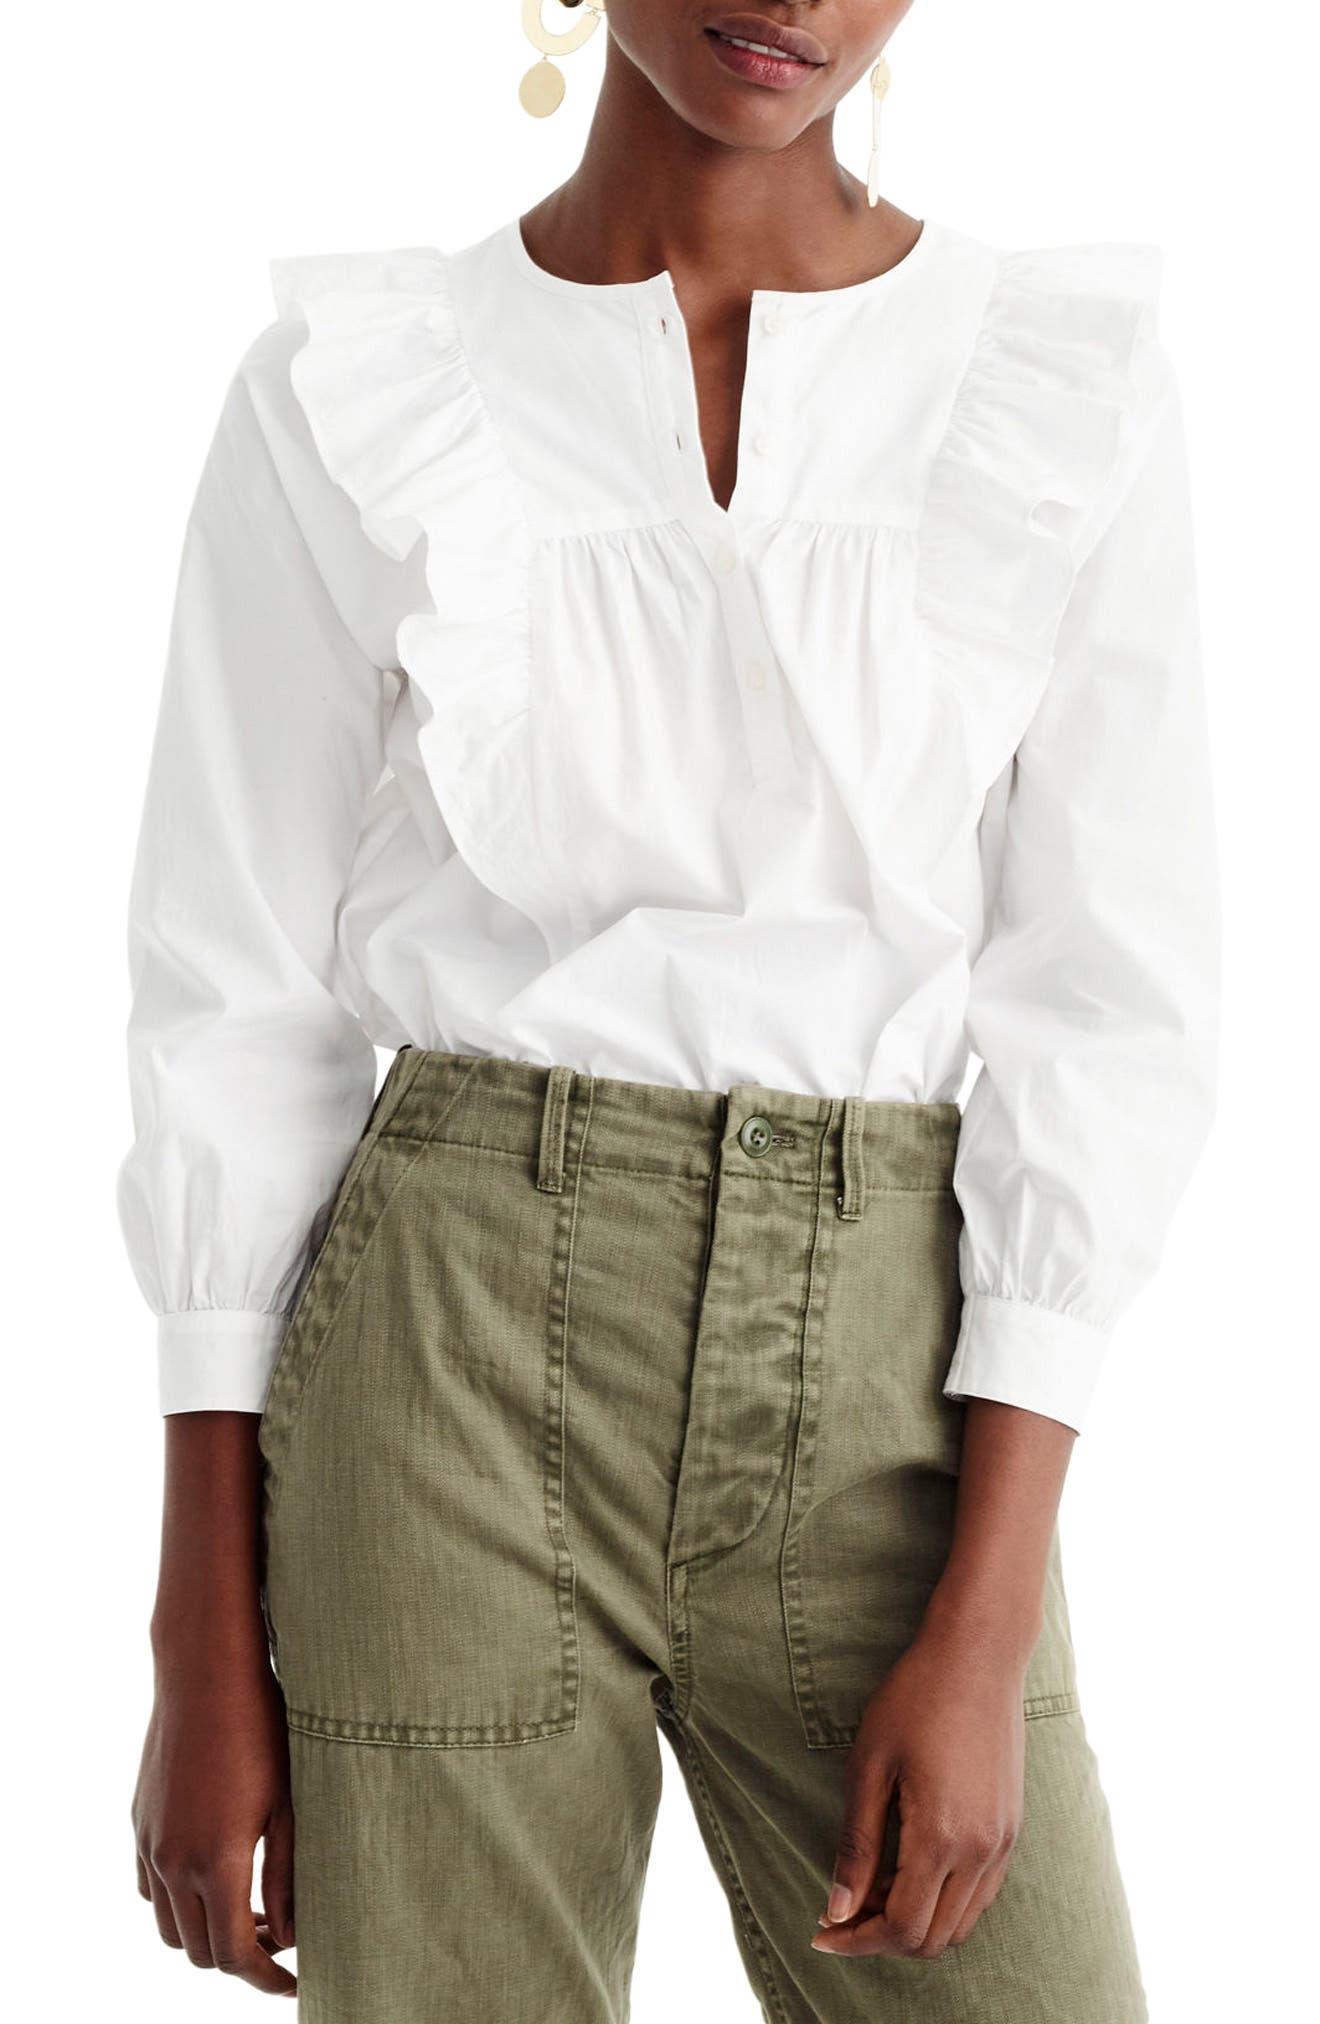 Alternate Image 1 Selected - J.Crew Ruffle Front Shirt (Regular & Petite)